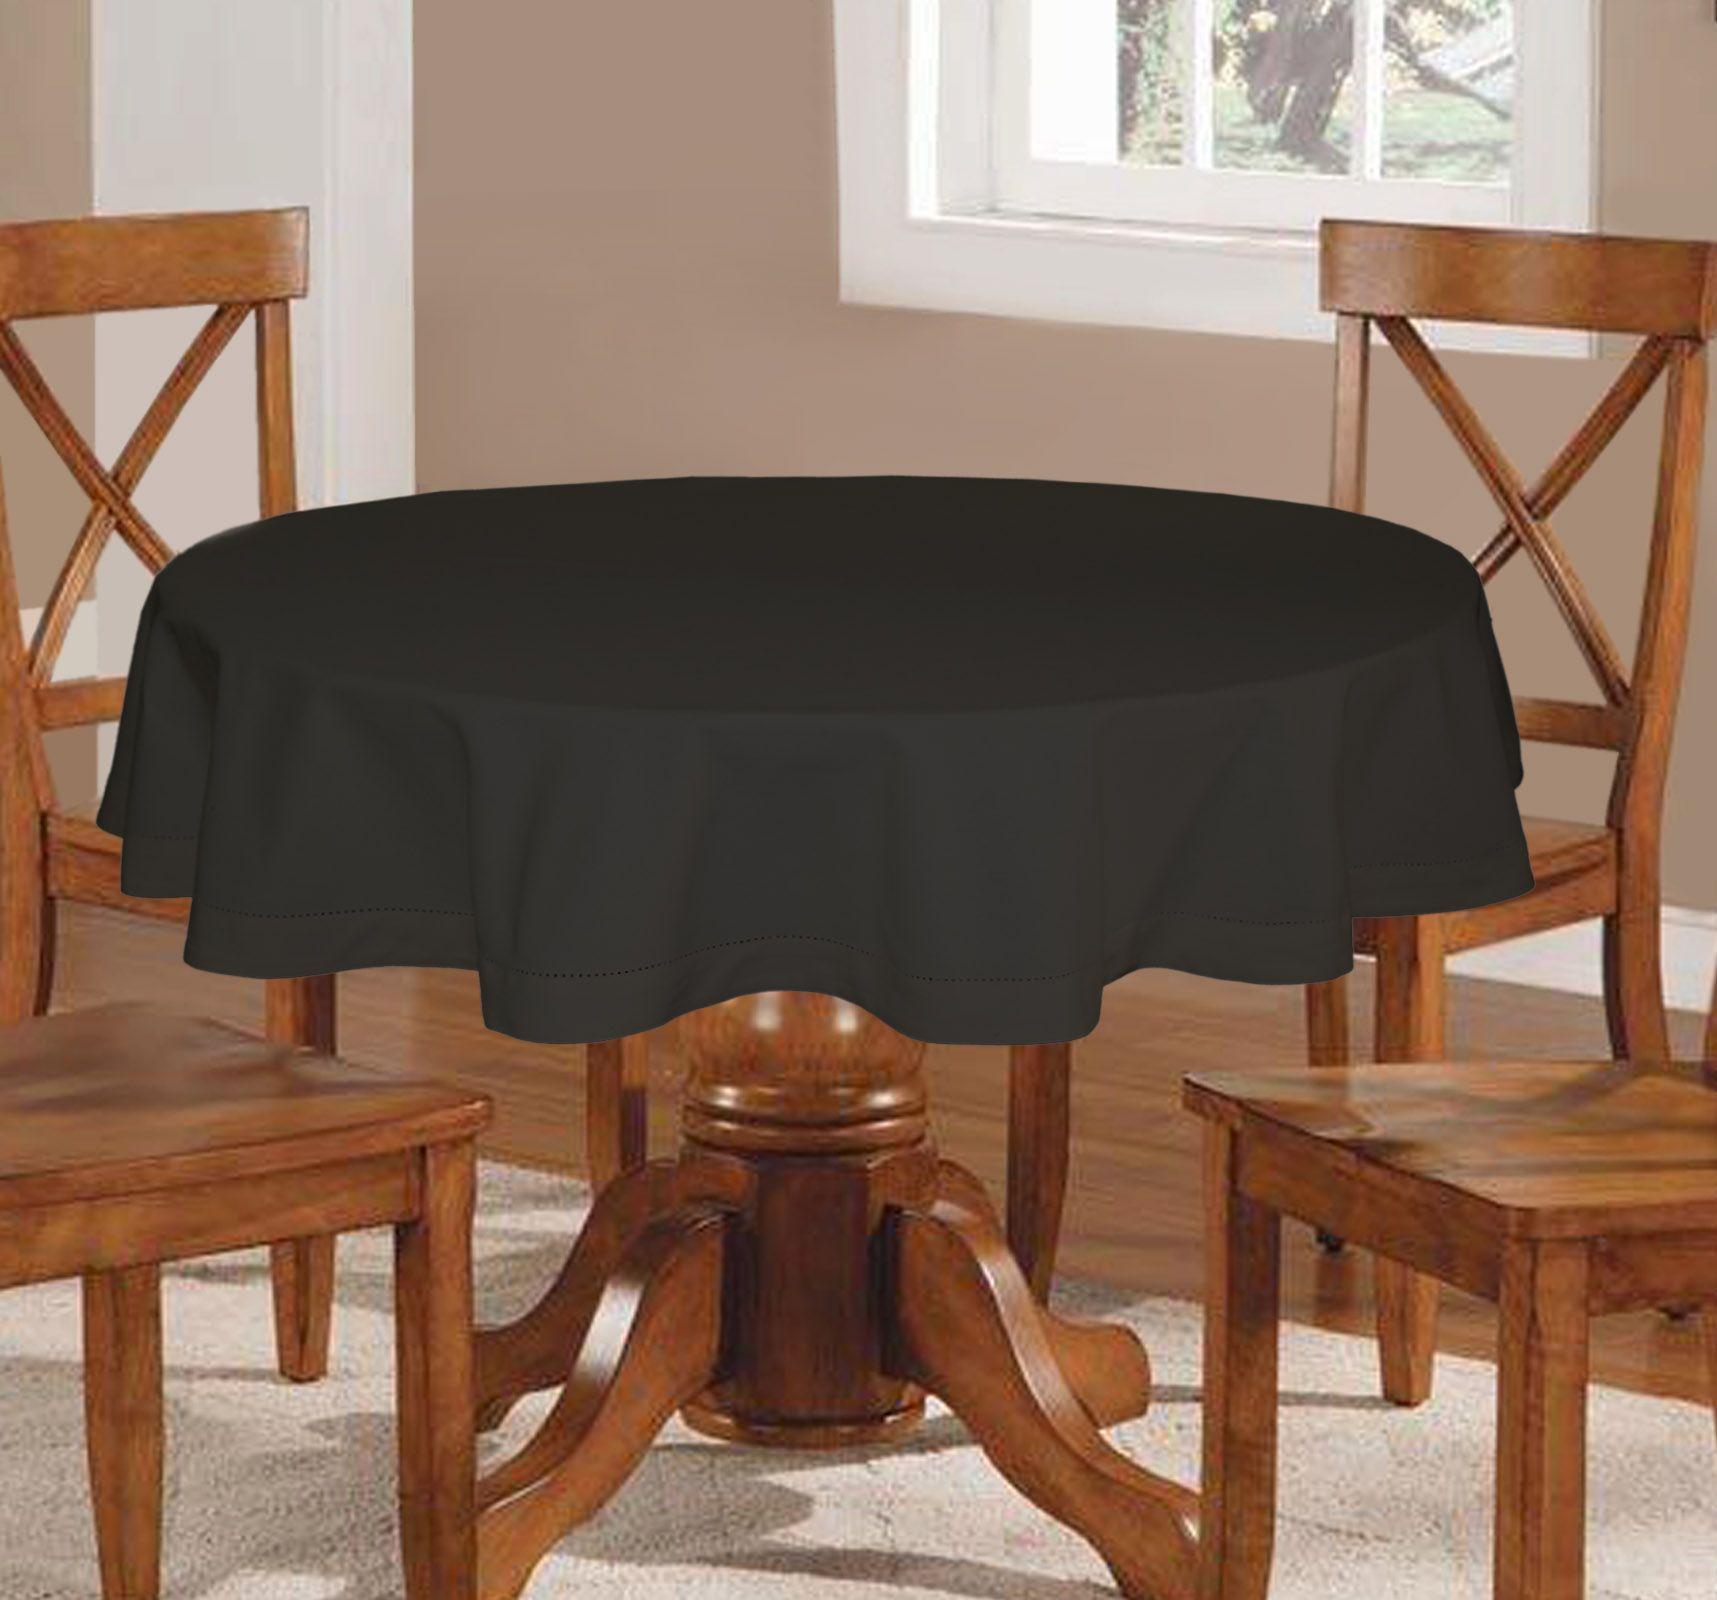 Plain Round Six Seater Table Cloth, Namaste Fashion